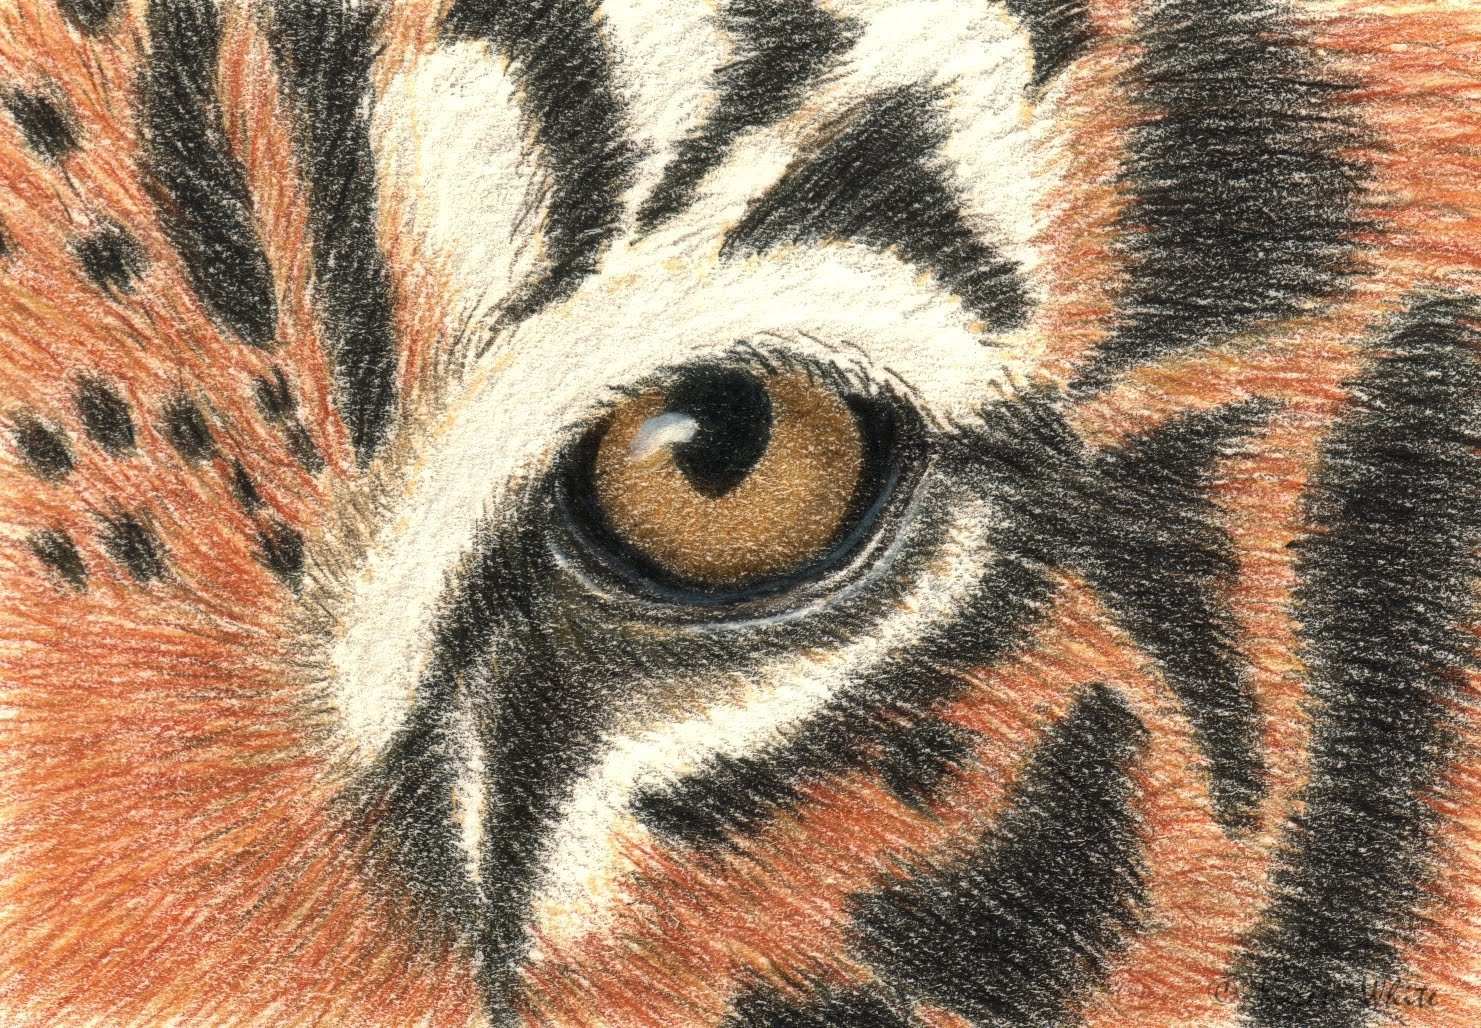 helm tigers eye repeat - HD1481×1028